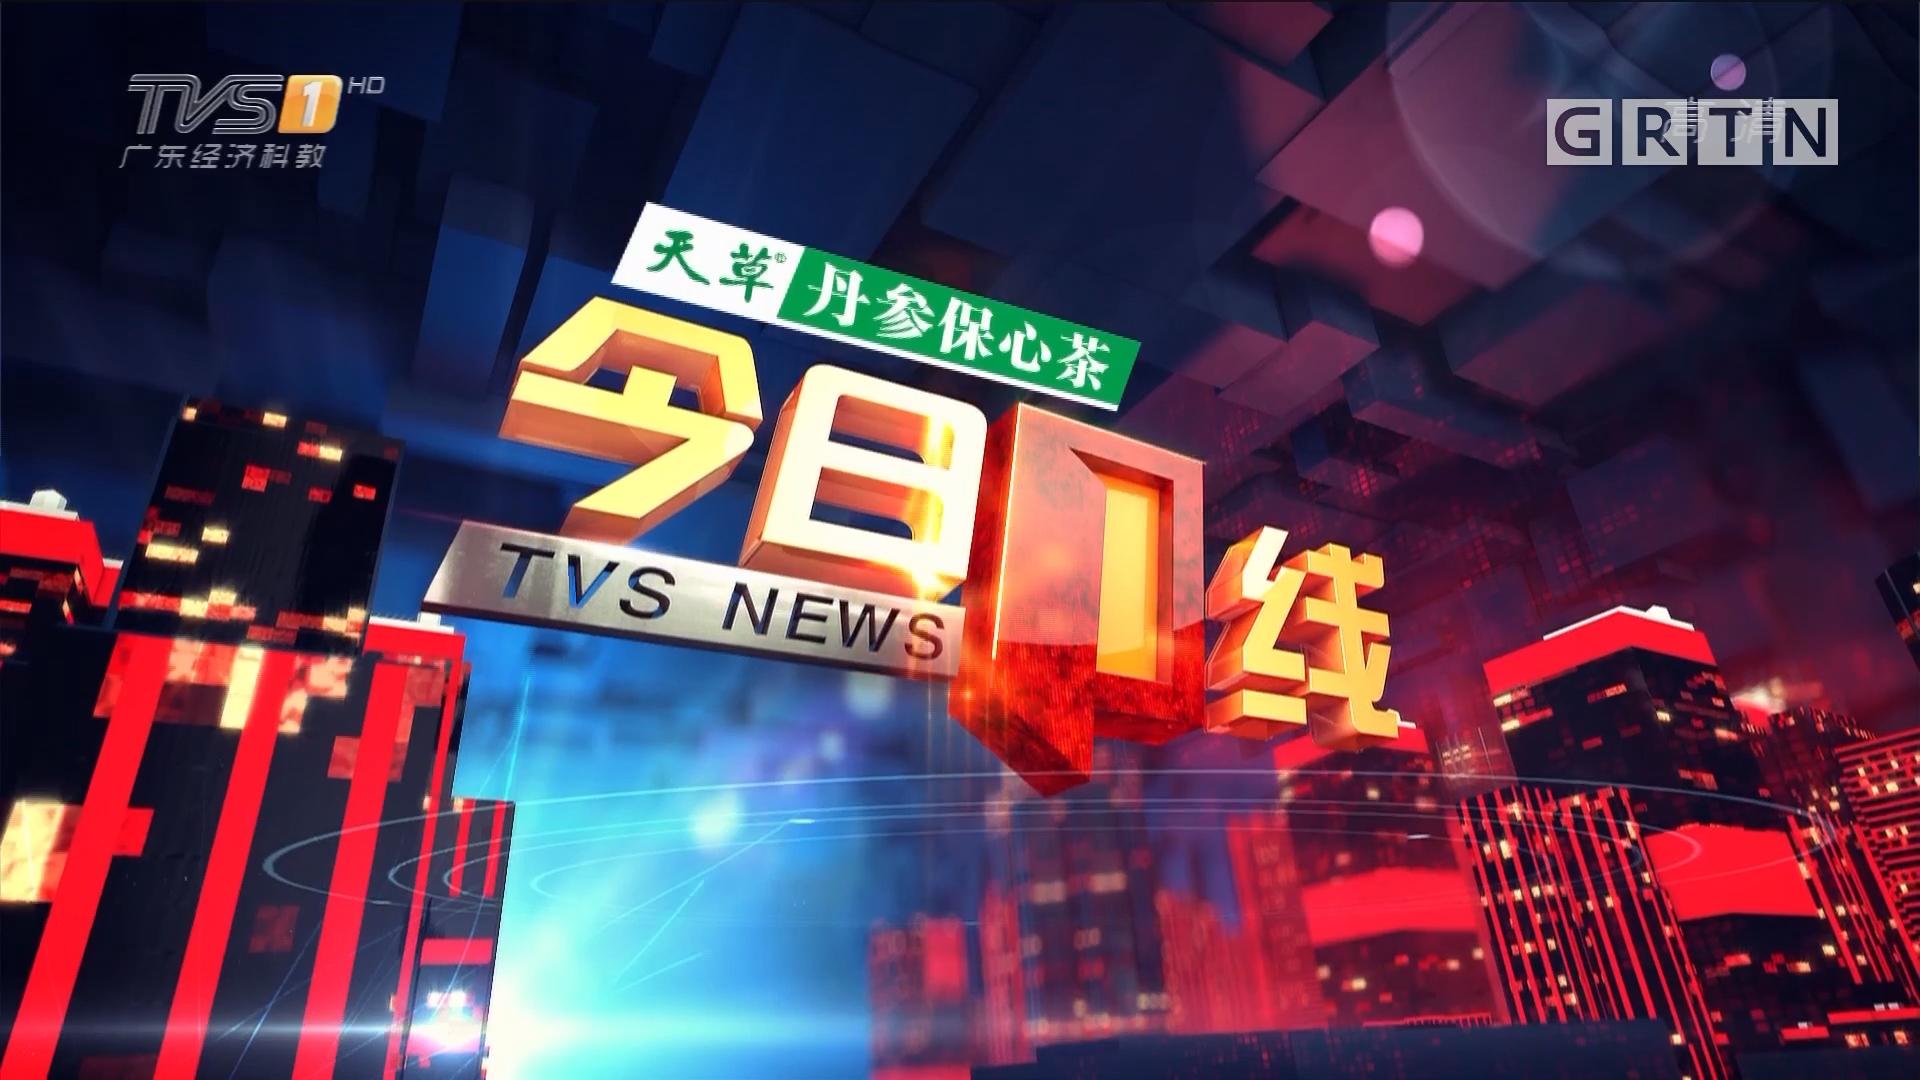 [HD][2017-05-25]今日一线:深圳龙岗:失主遗落手提袋 民警狂追公交车